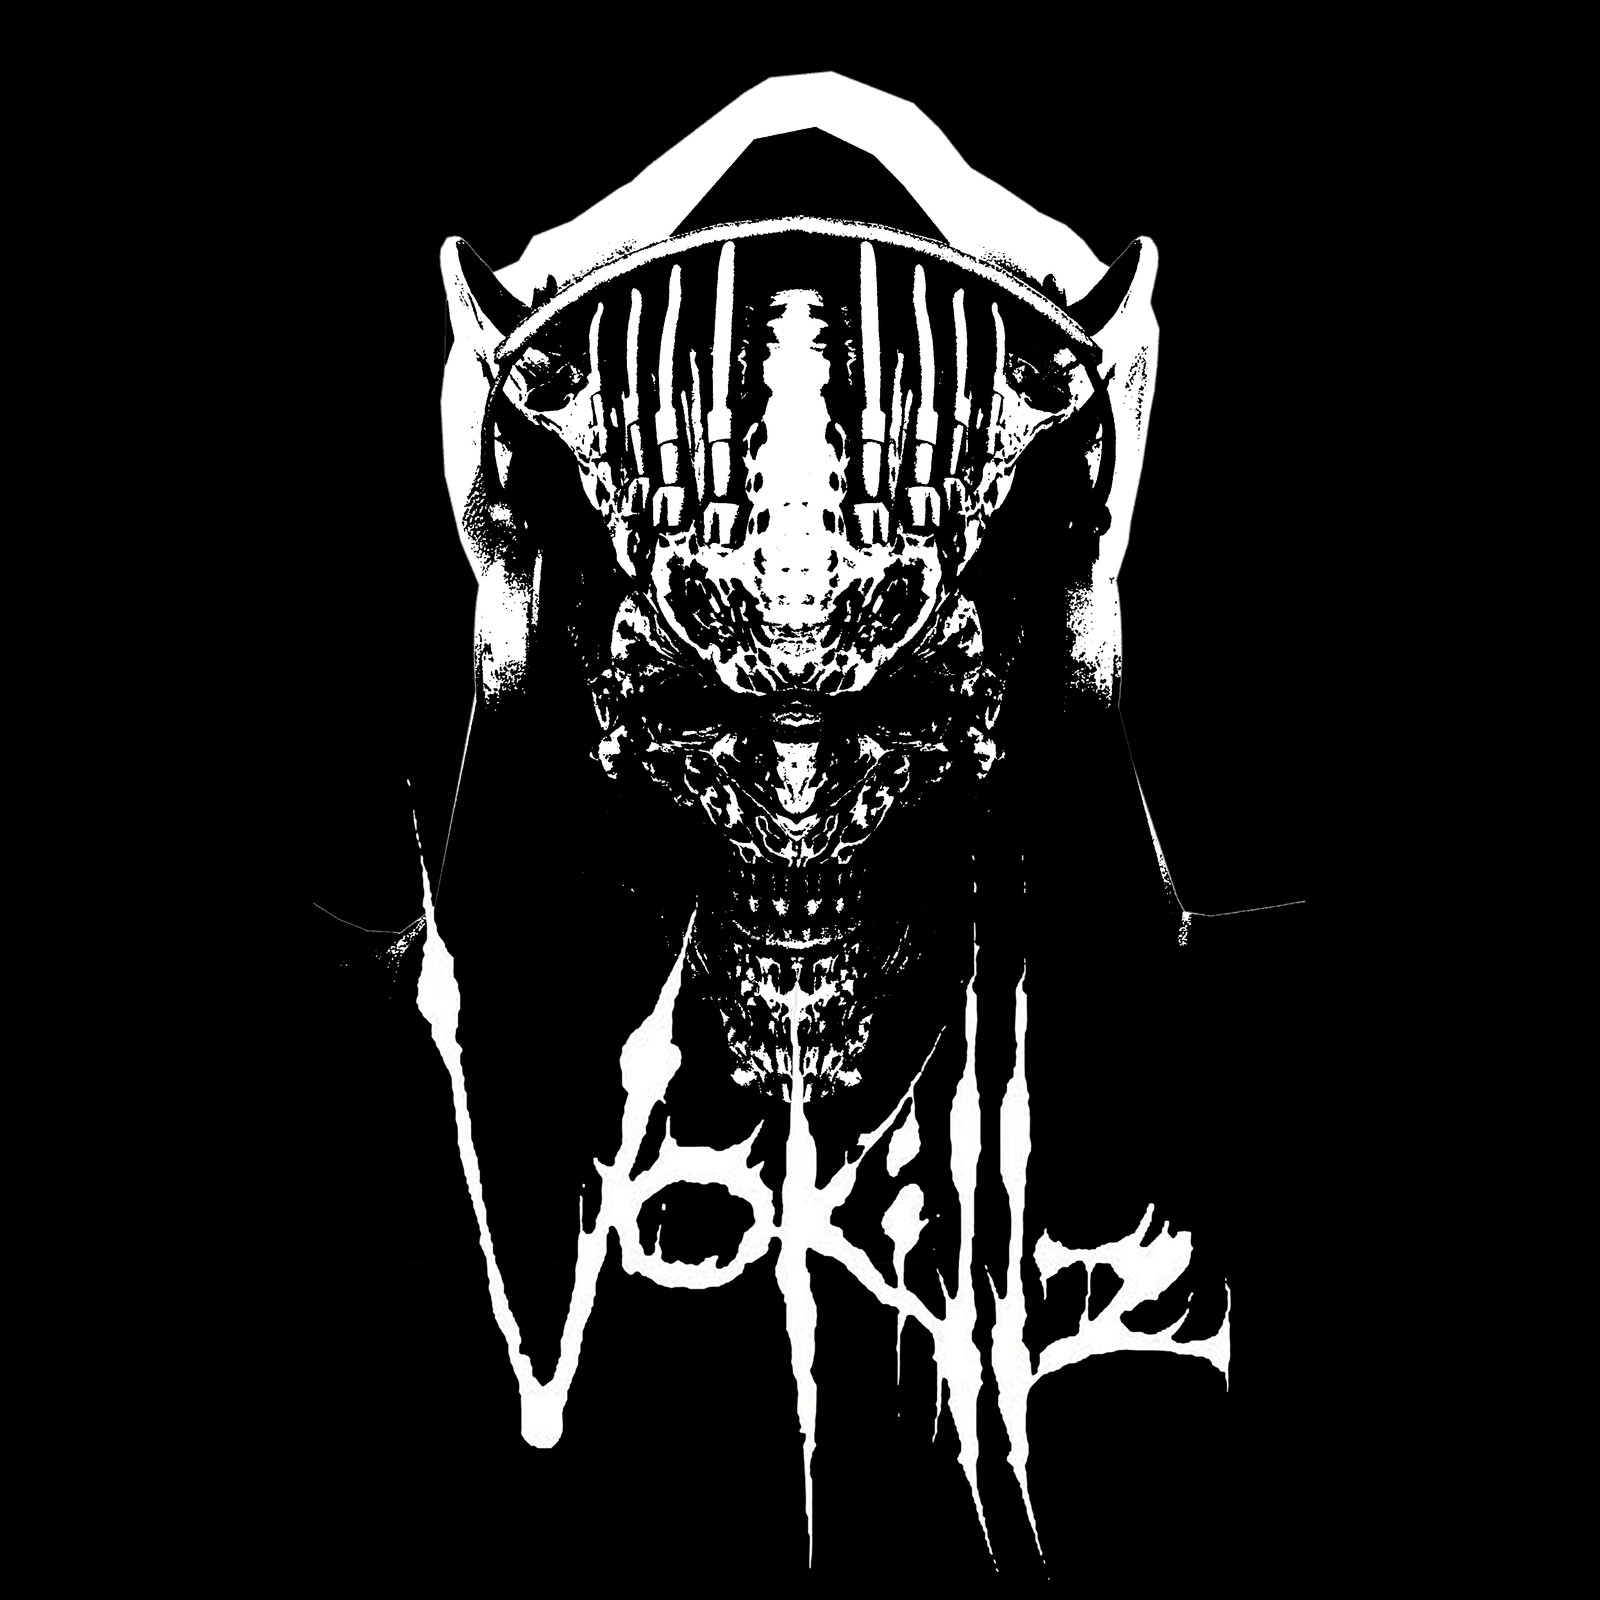 Logo & Merch Designs | Vokillz (Musician)